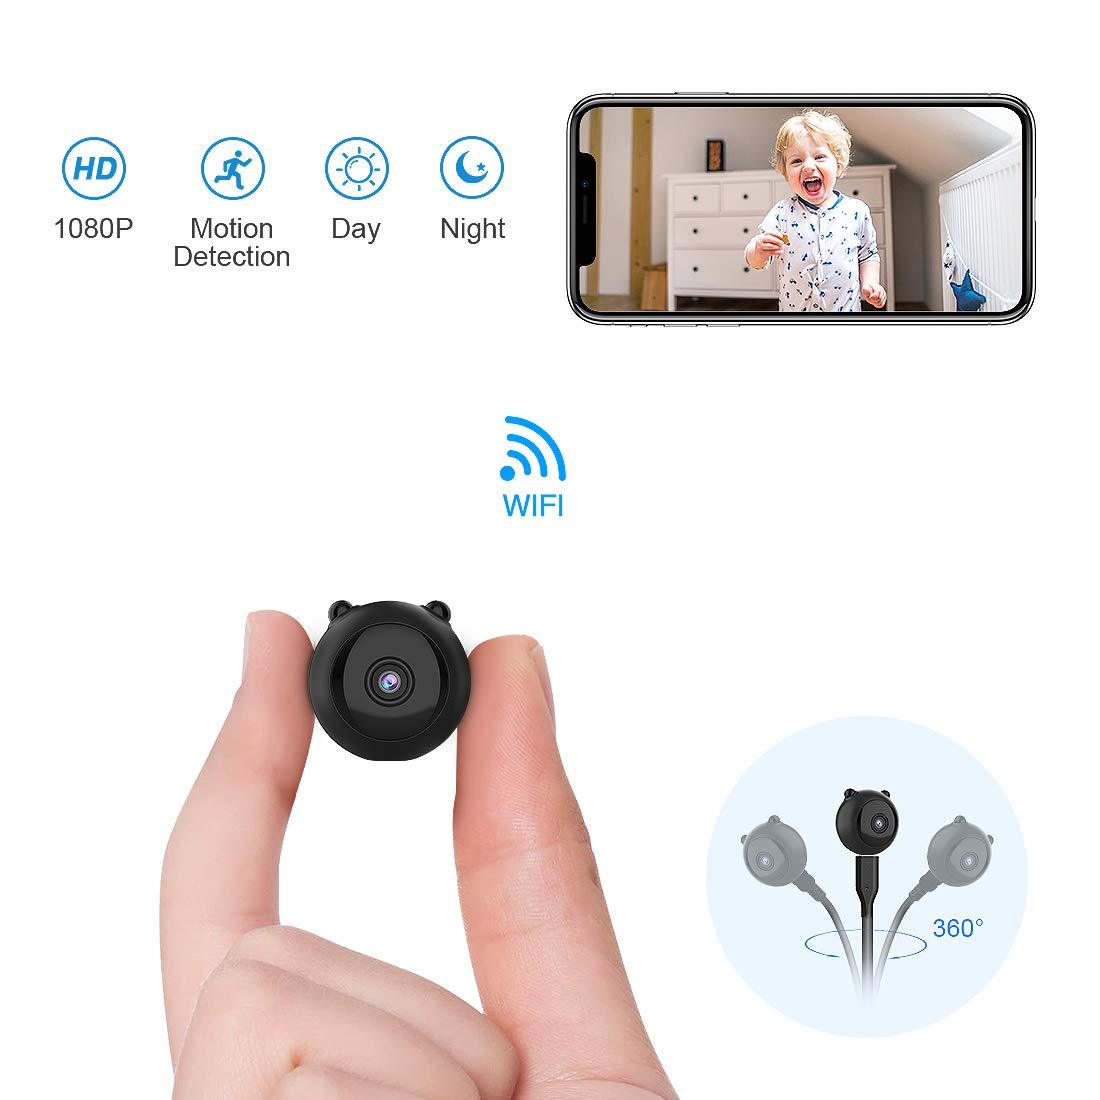 Mini Cámara Espía Oculta AOBO 1080P HD WiFi Cámara Portátil con Visión Nocturna y Conexión Remota Desde iPhone/Android Phone/iPad/PC Camaras IP de ...